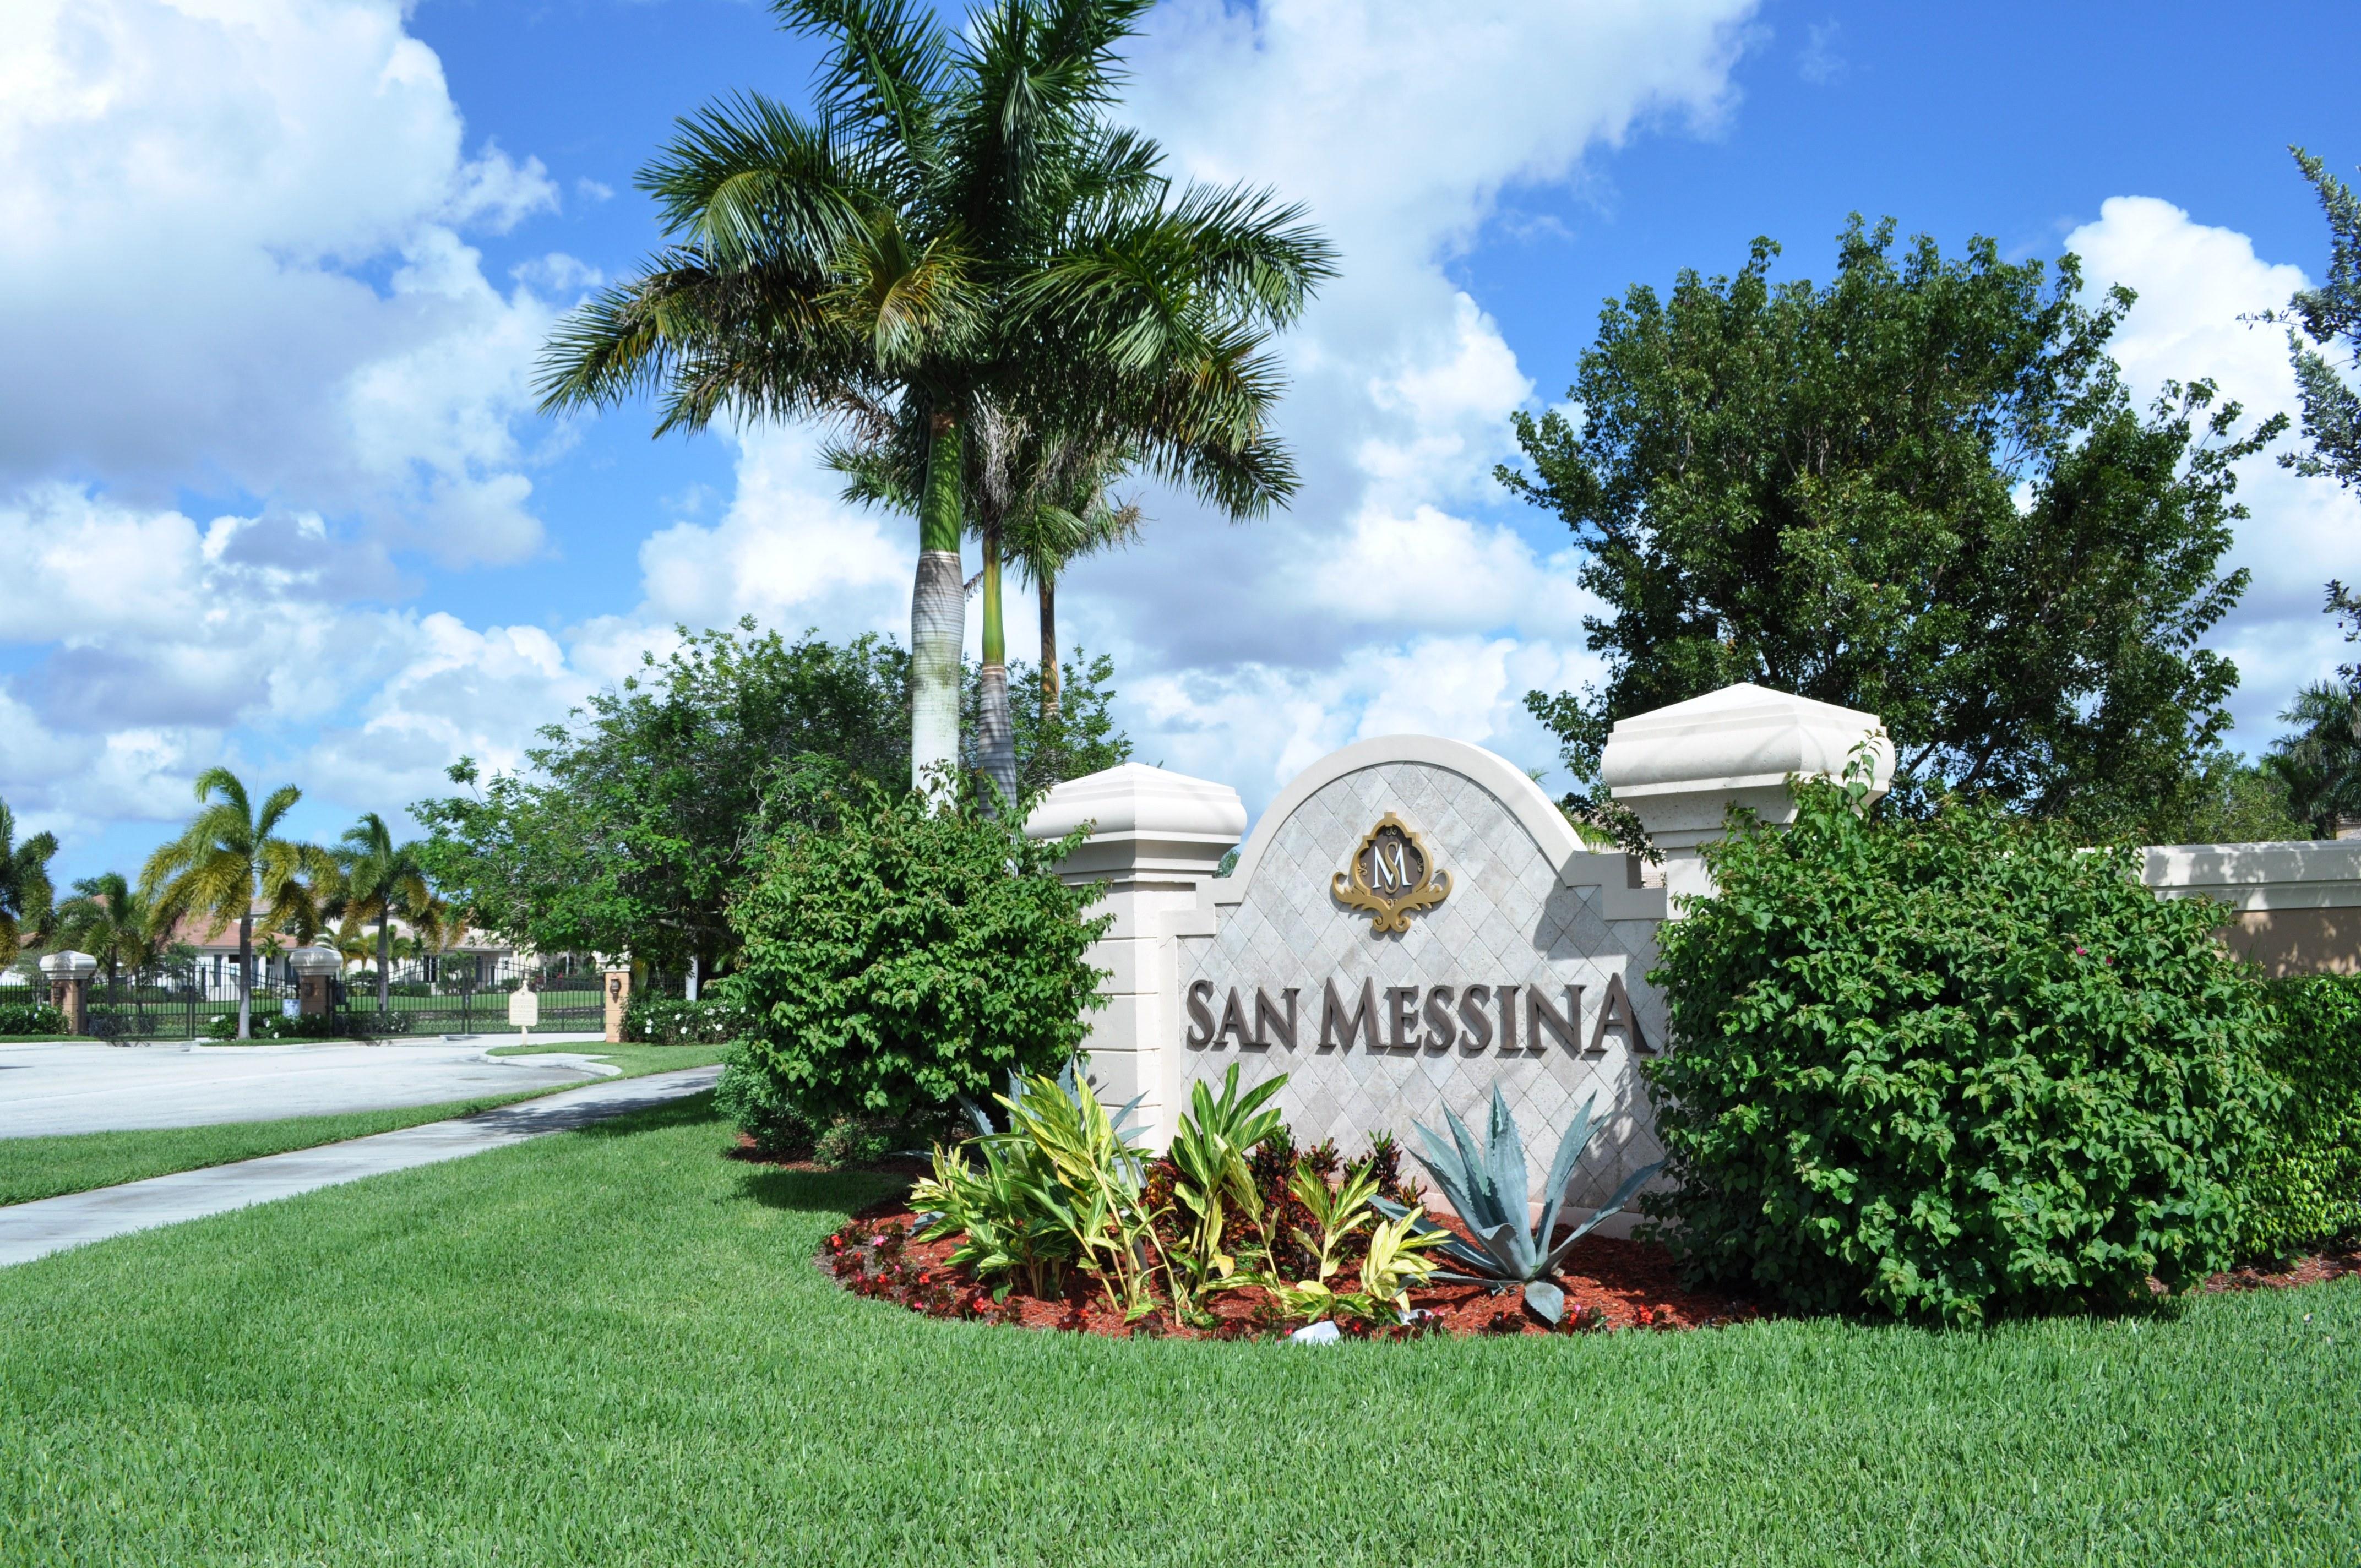 San Messina